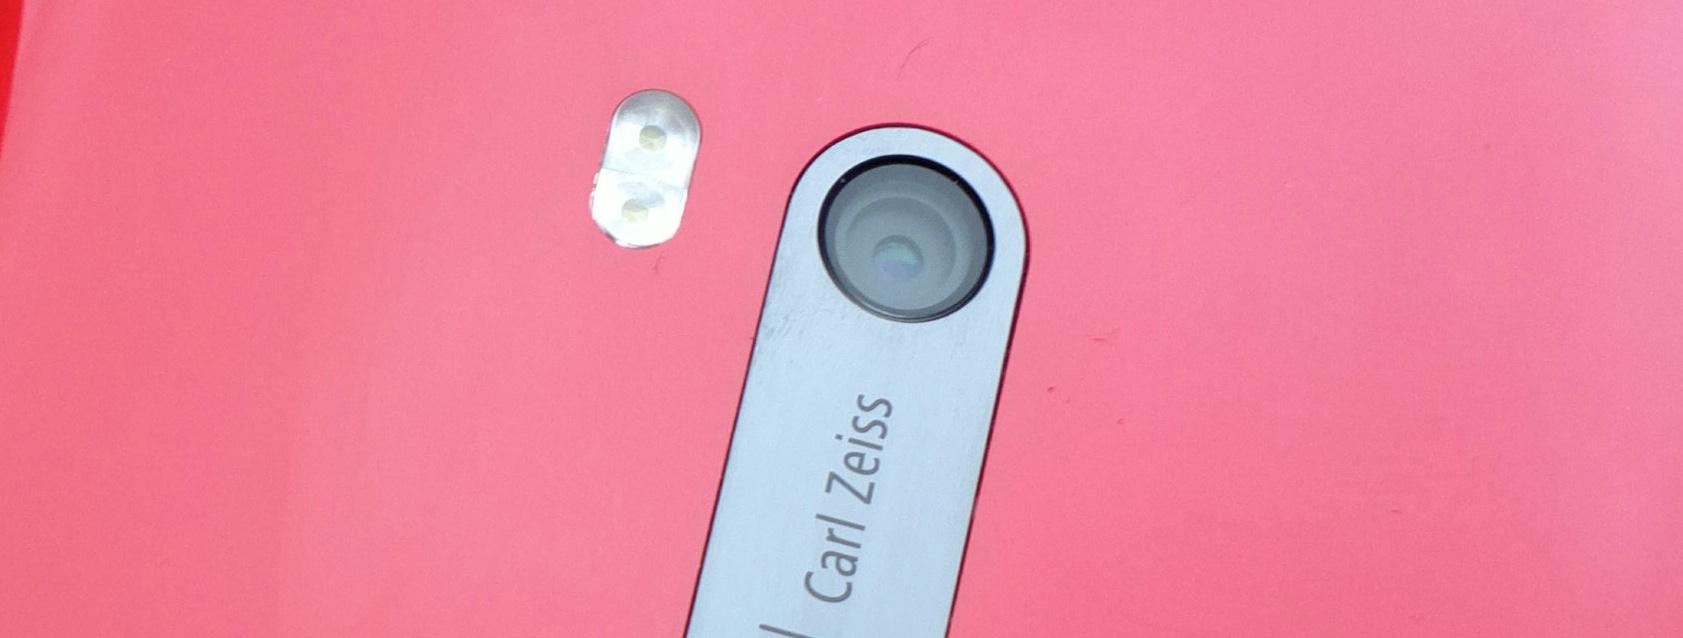 Lumia 920 camera